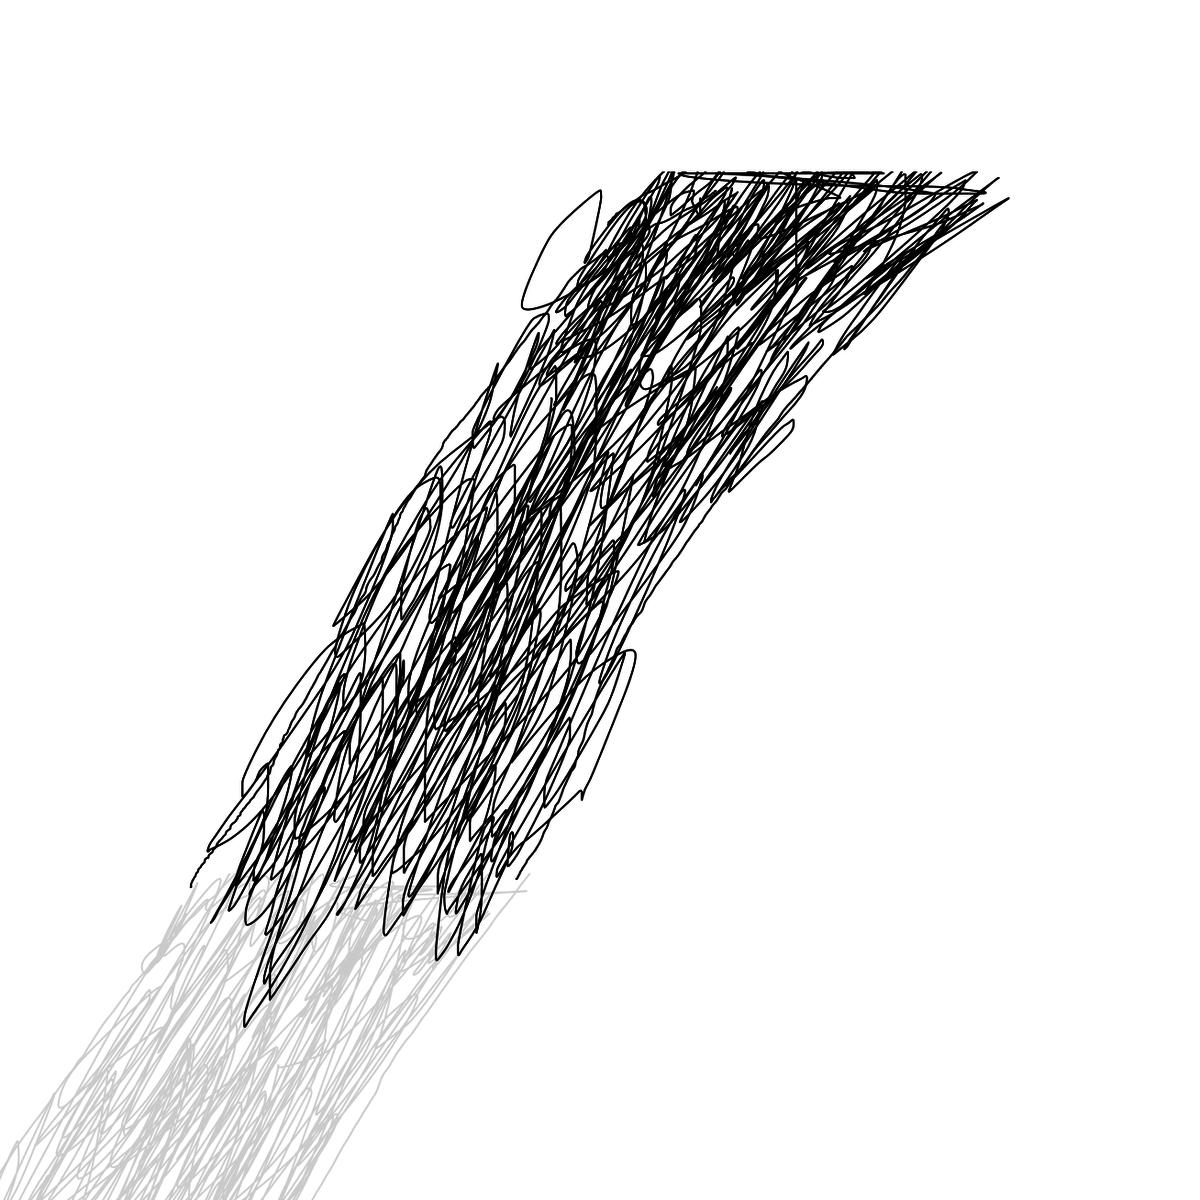 BAAAM drawing#11444 lat:52.4759483337402340lng: 13.4055404663085940